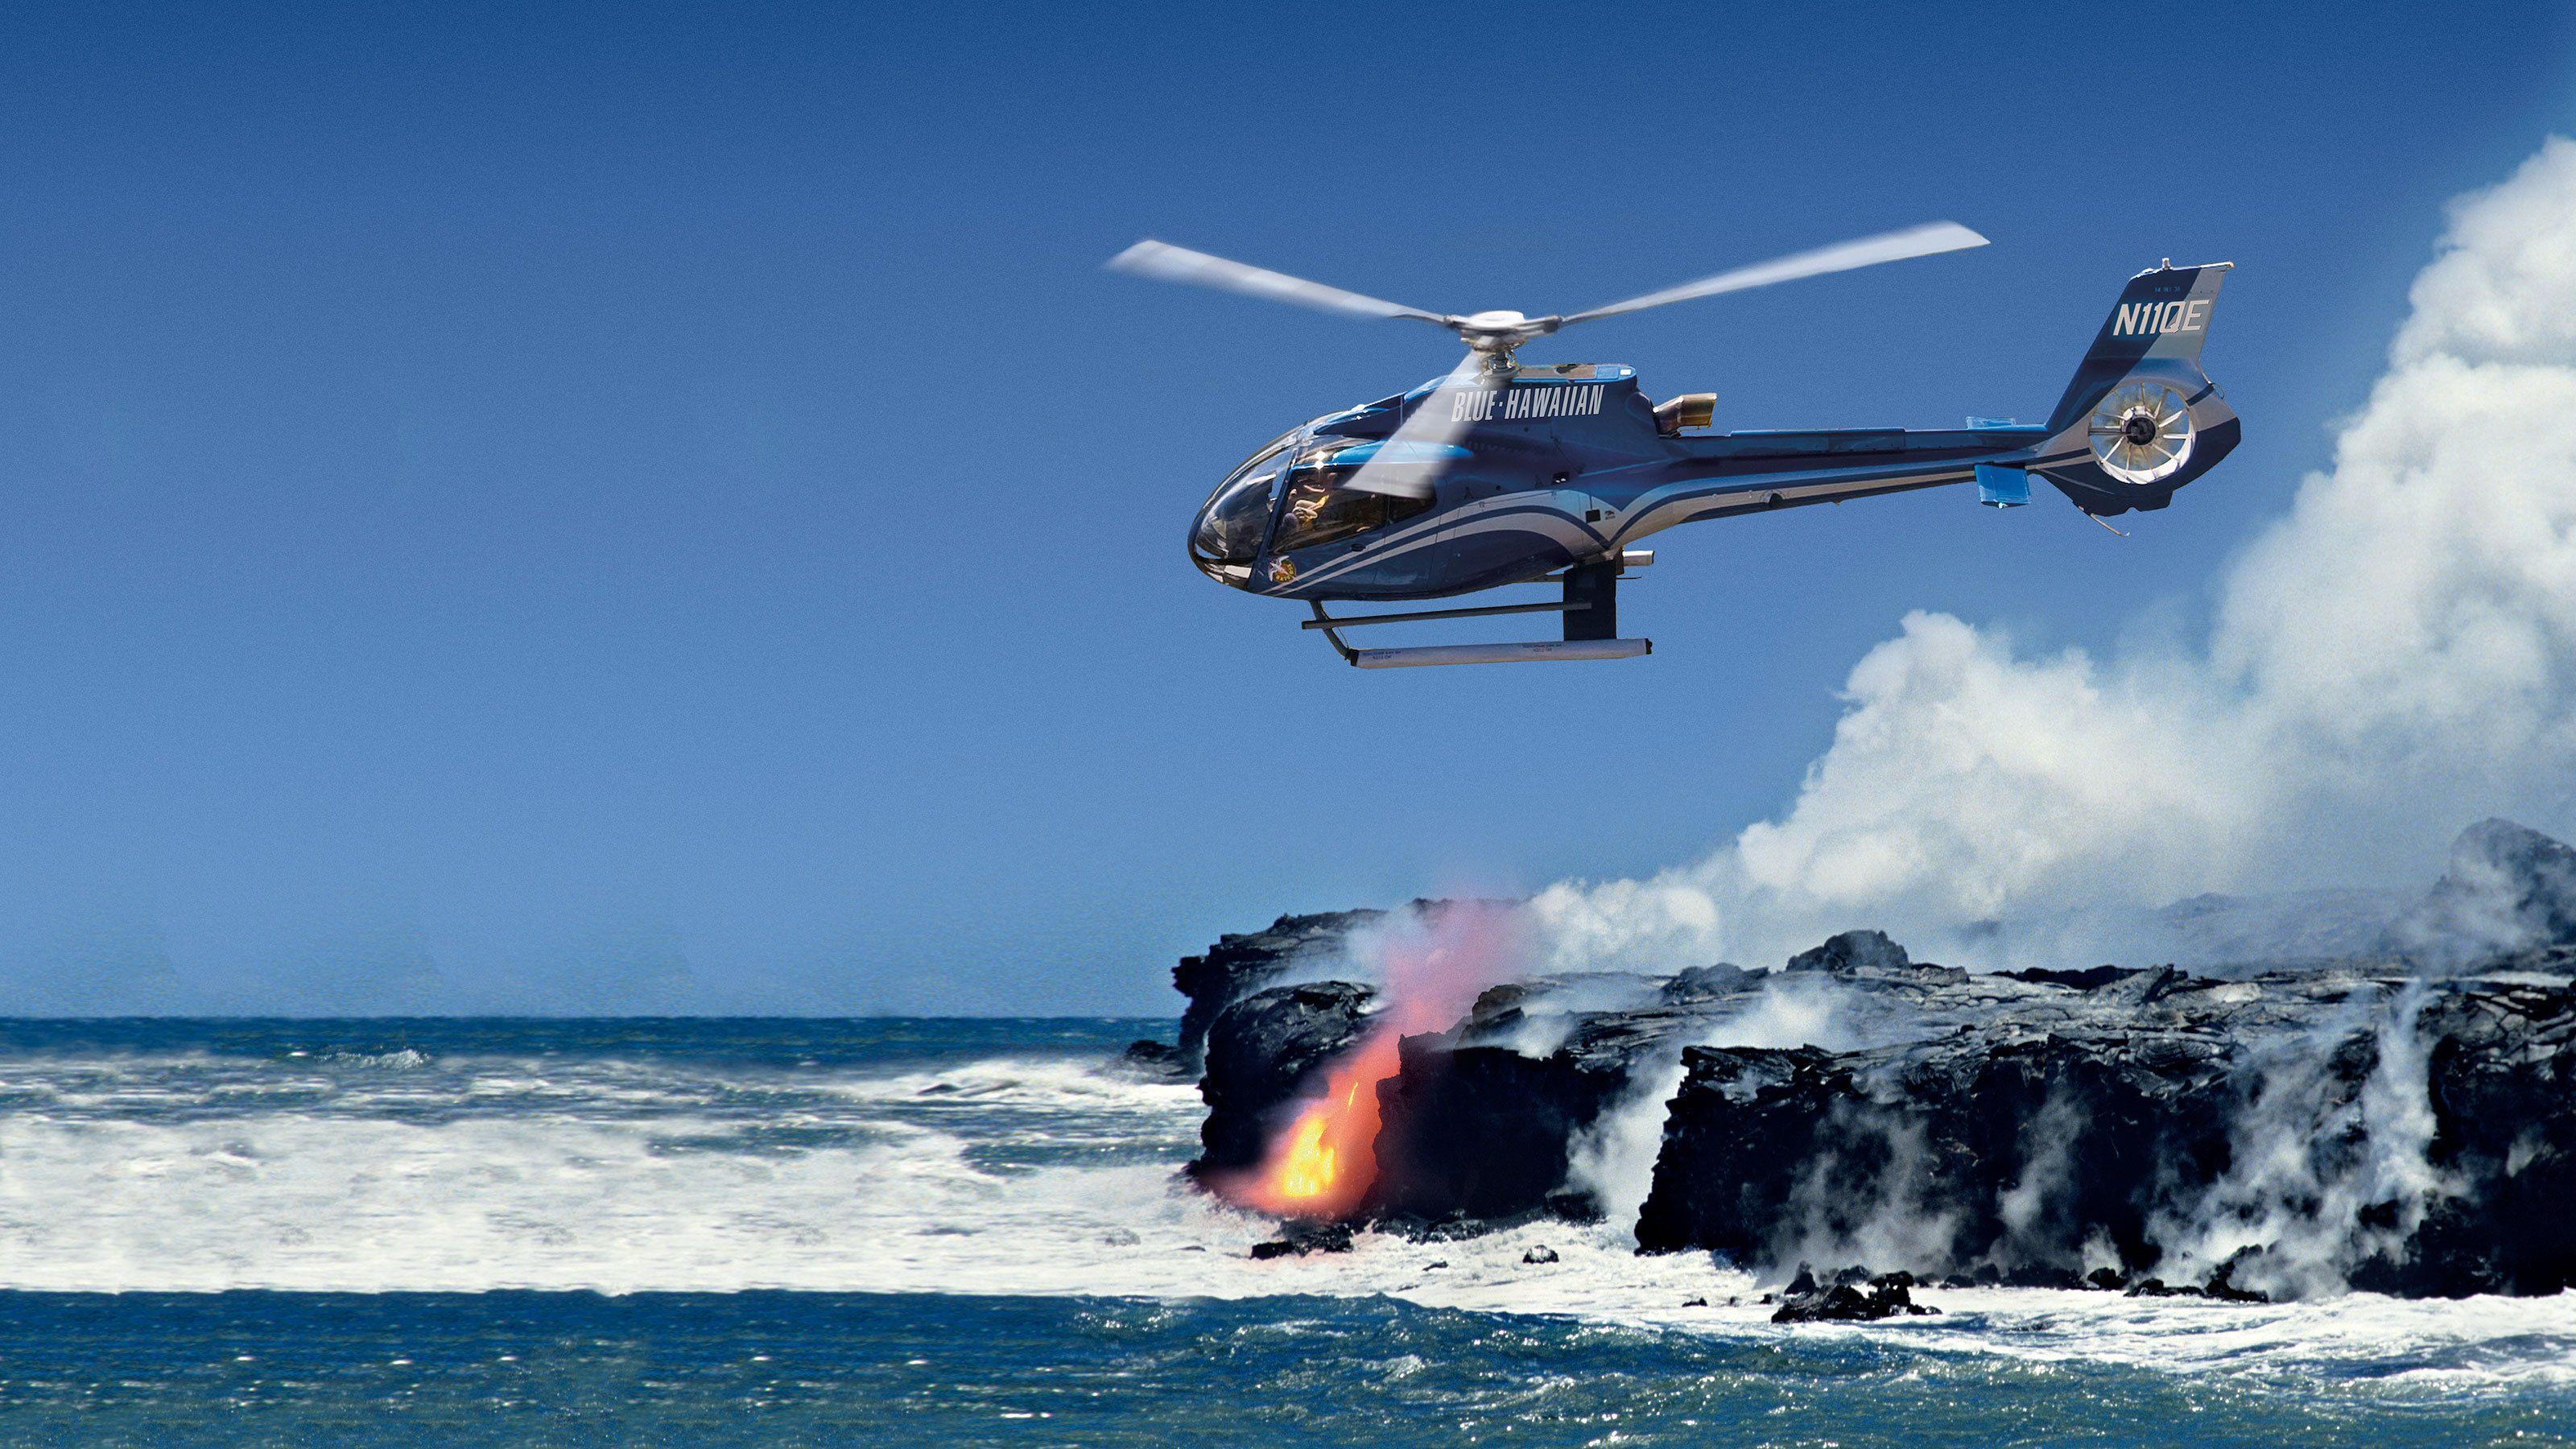 Volcano flying over lava entering the ocean in Hawaii